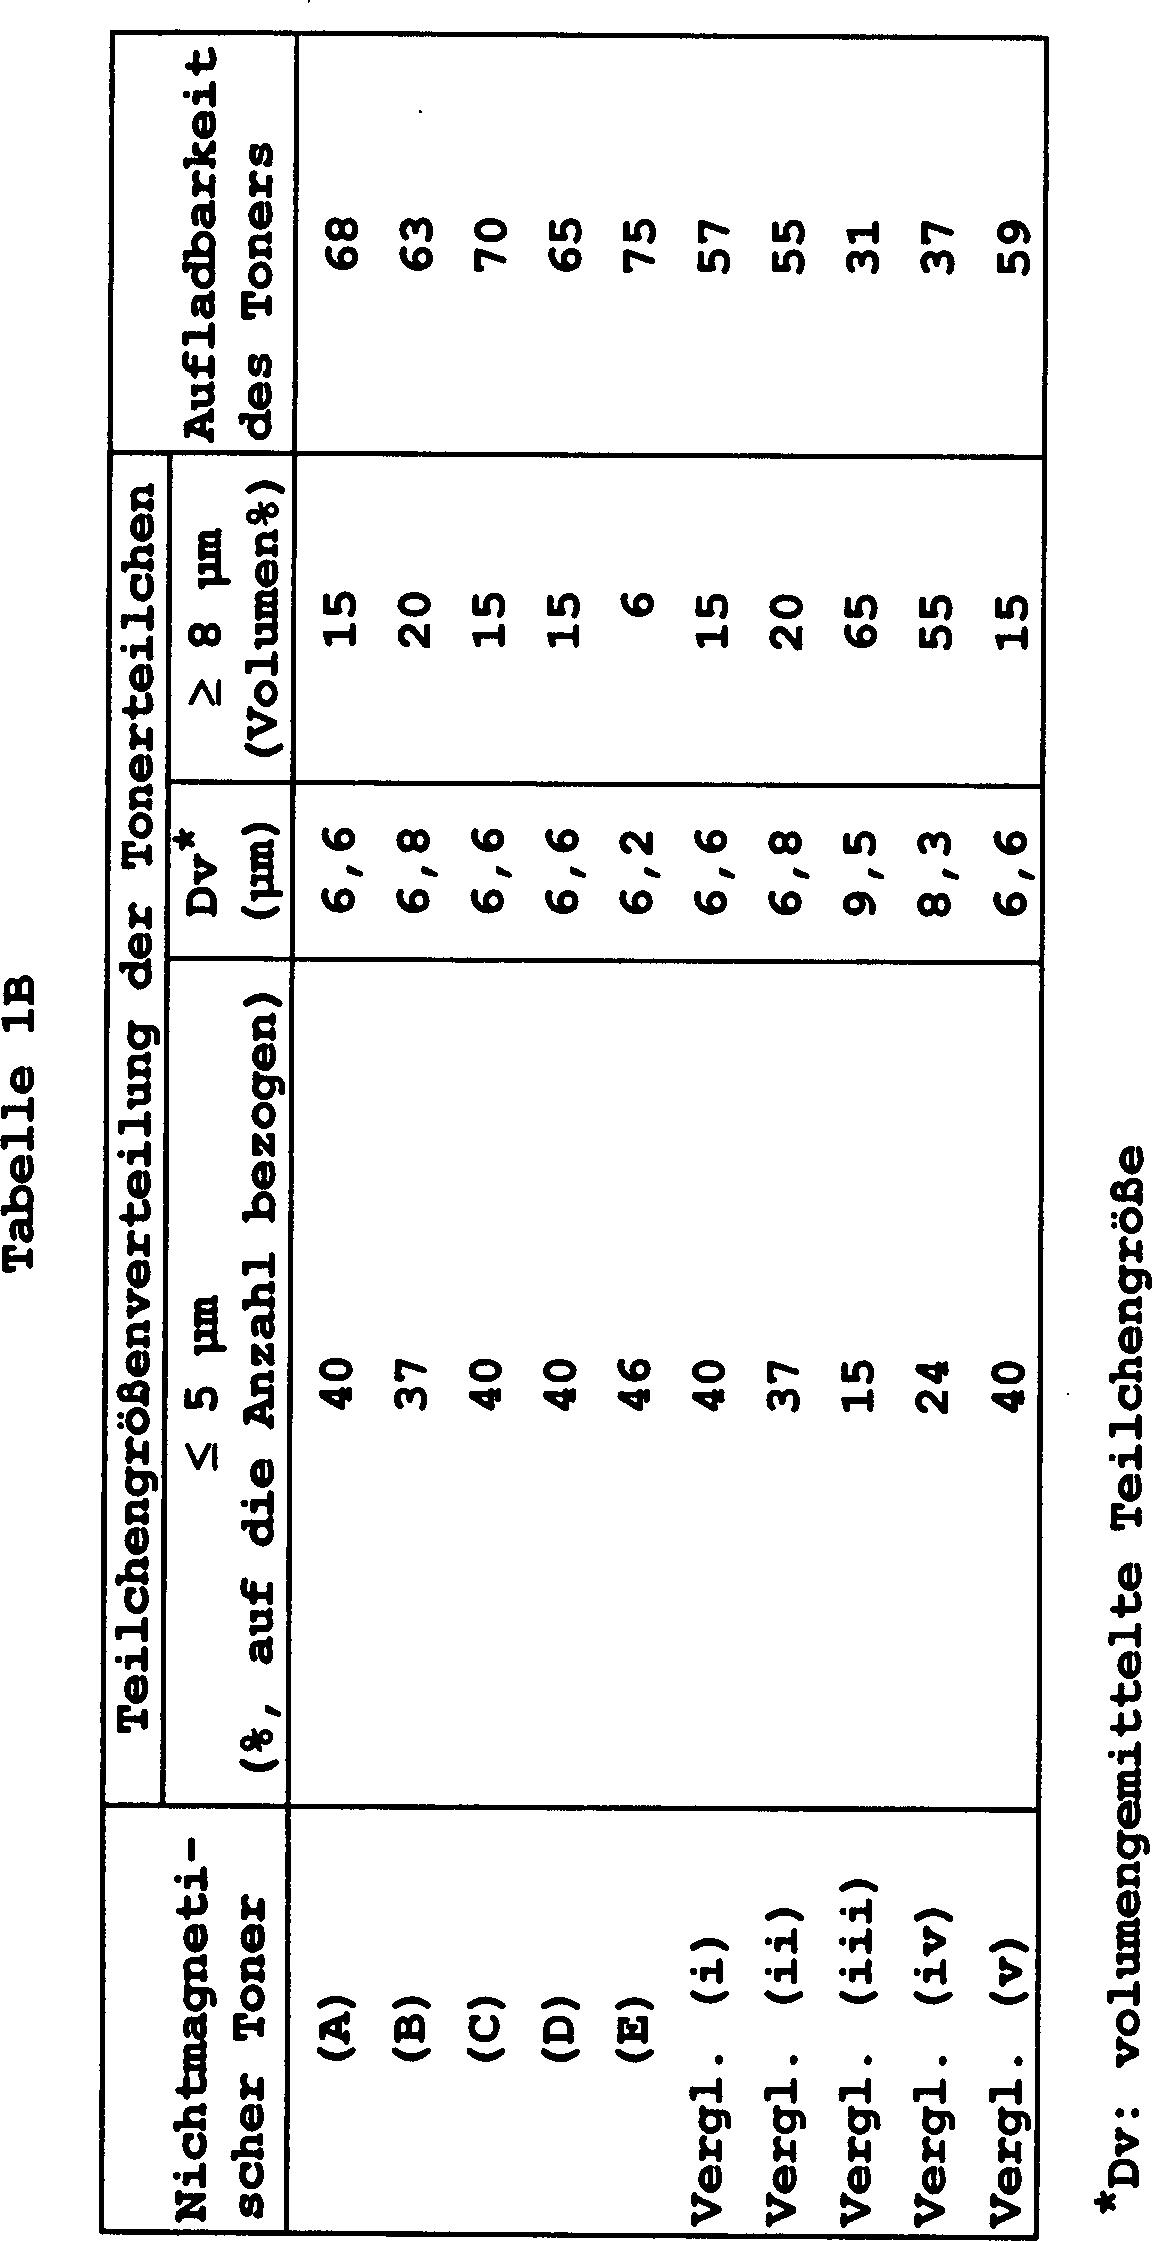 Ep1246925b1 Di Or Oligomer Of A Dimer Trimer 8